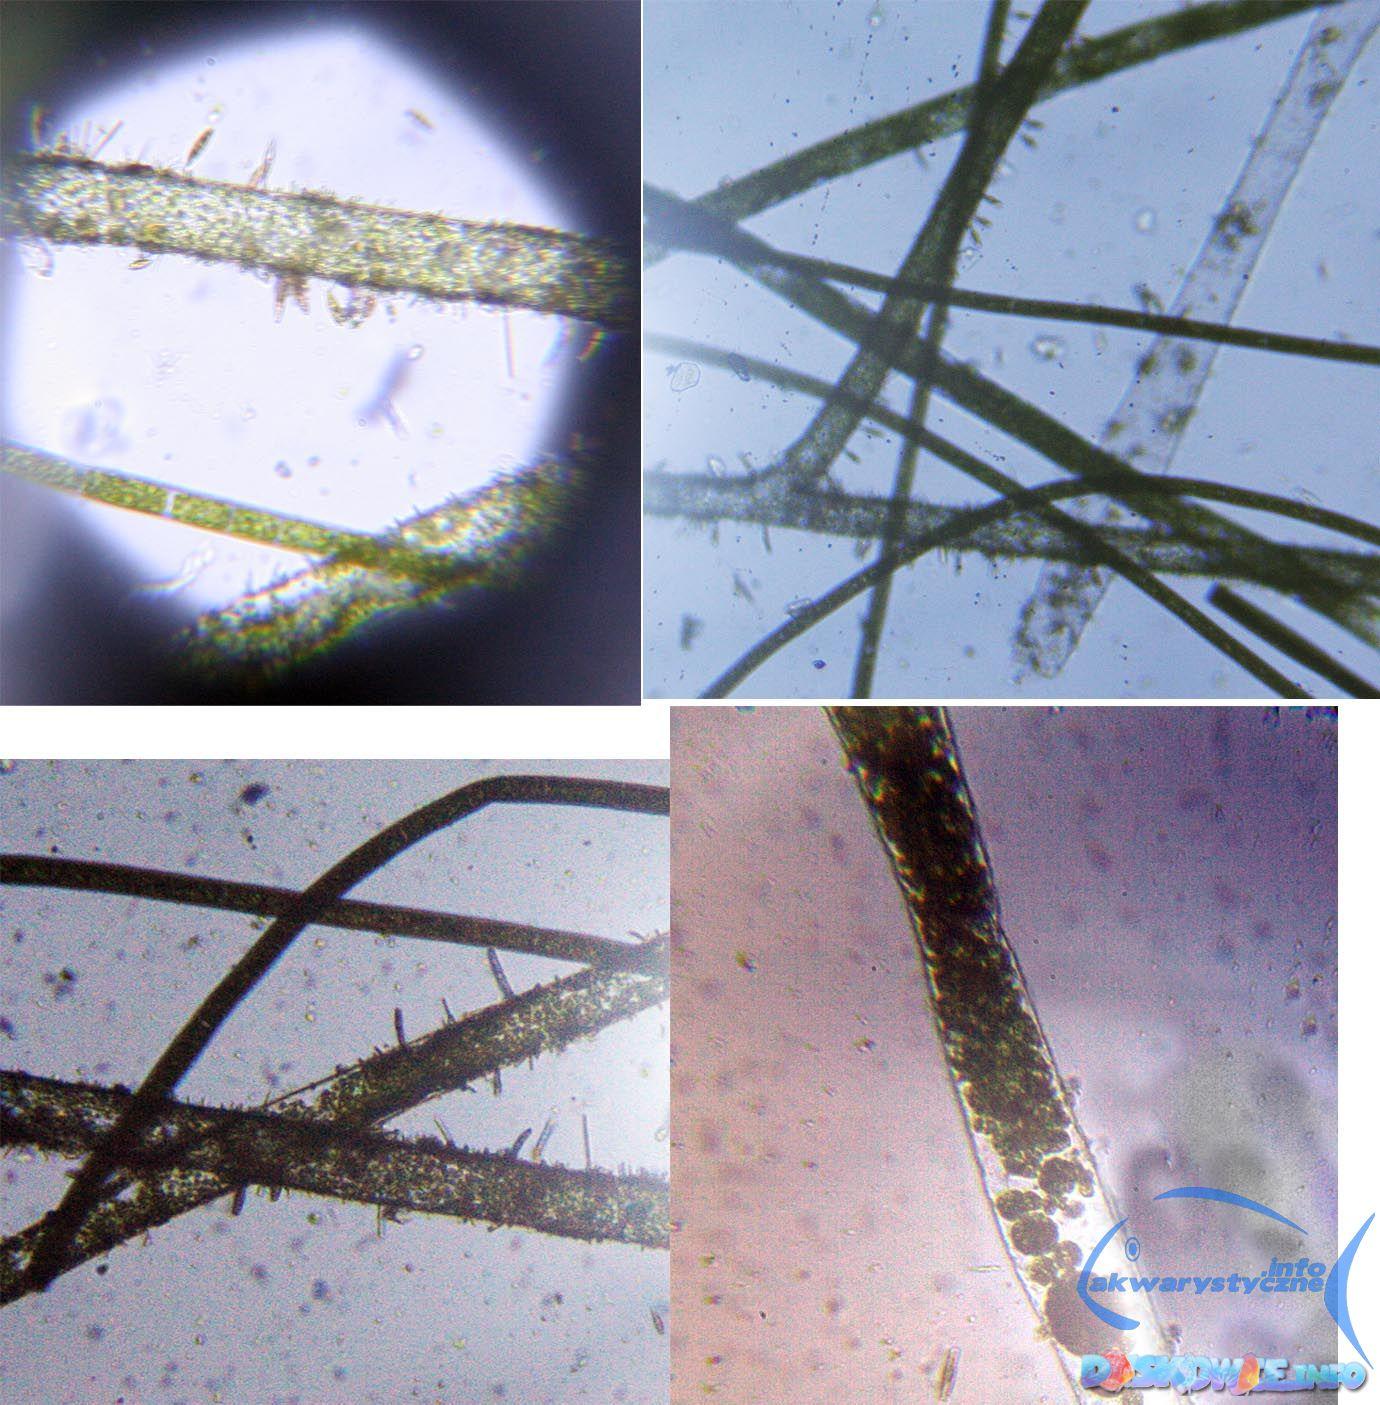 [Obrazek: mikroszkop.jpg]